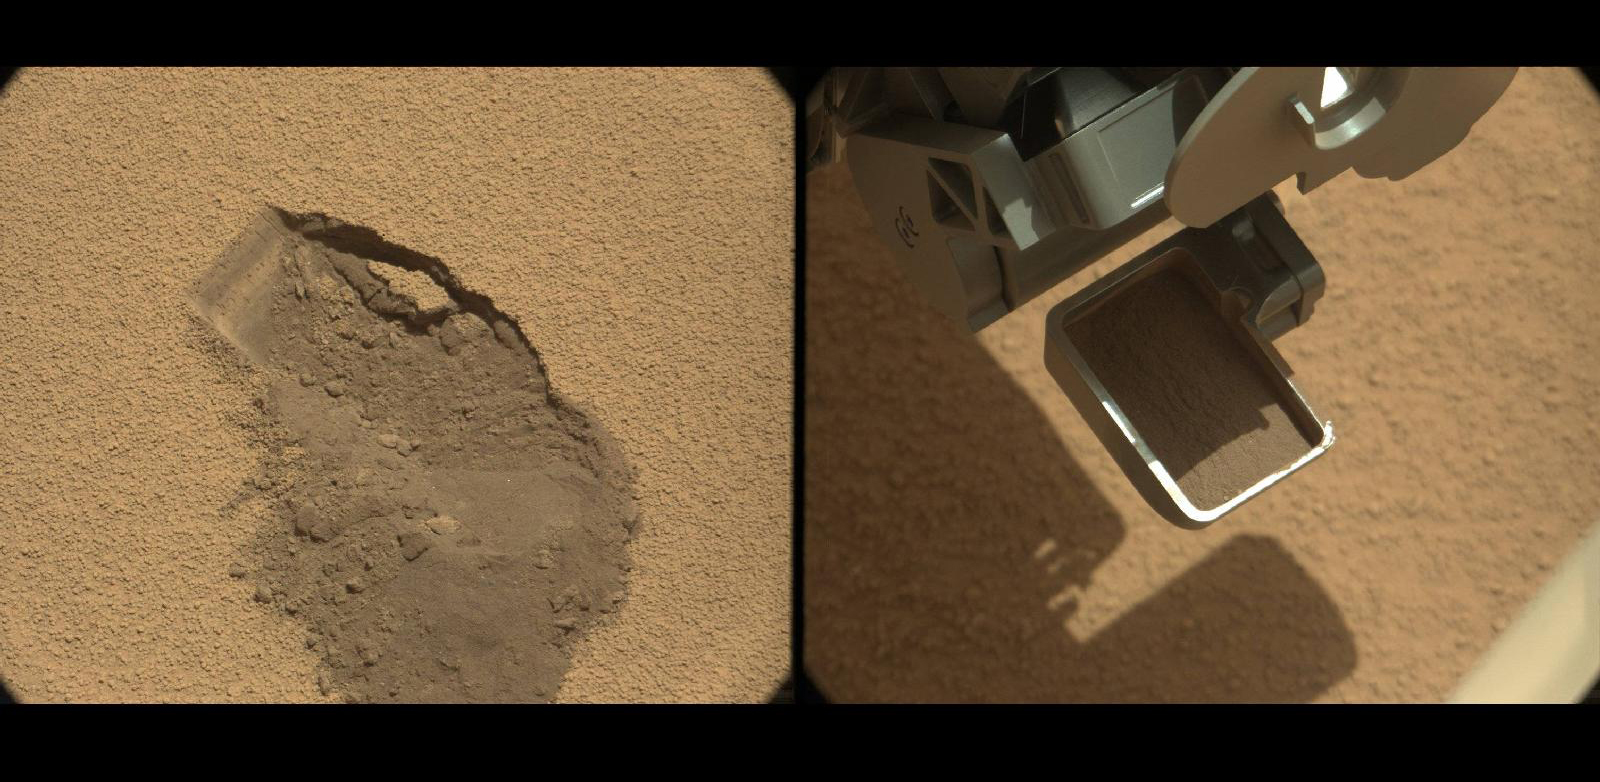 mars rover dirt meme - photo #16